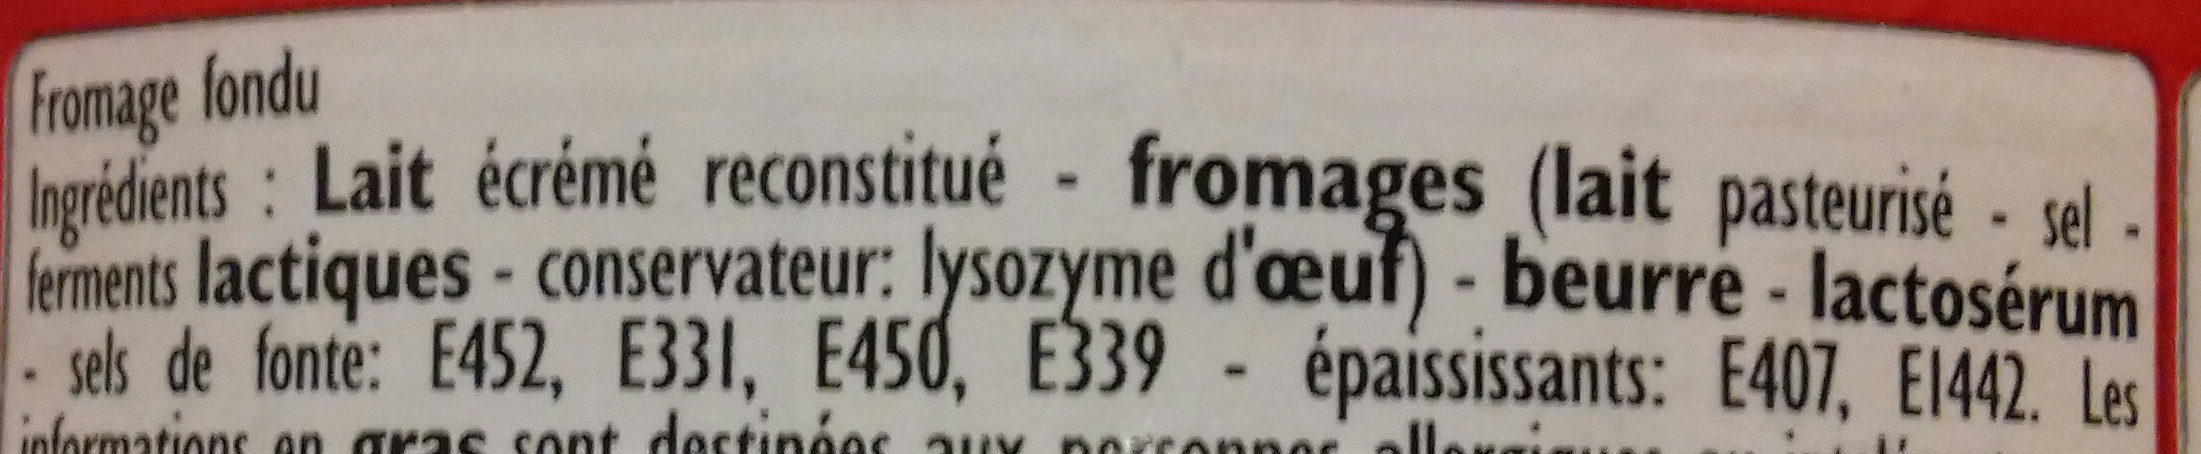 P'tits fondus - Ingrediënten - fr